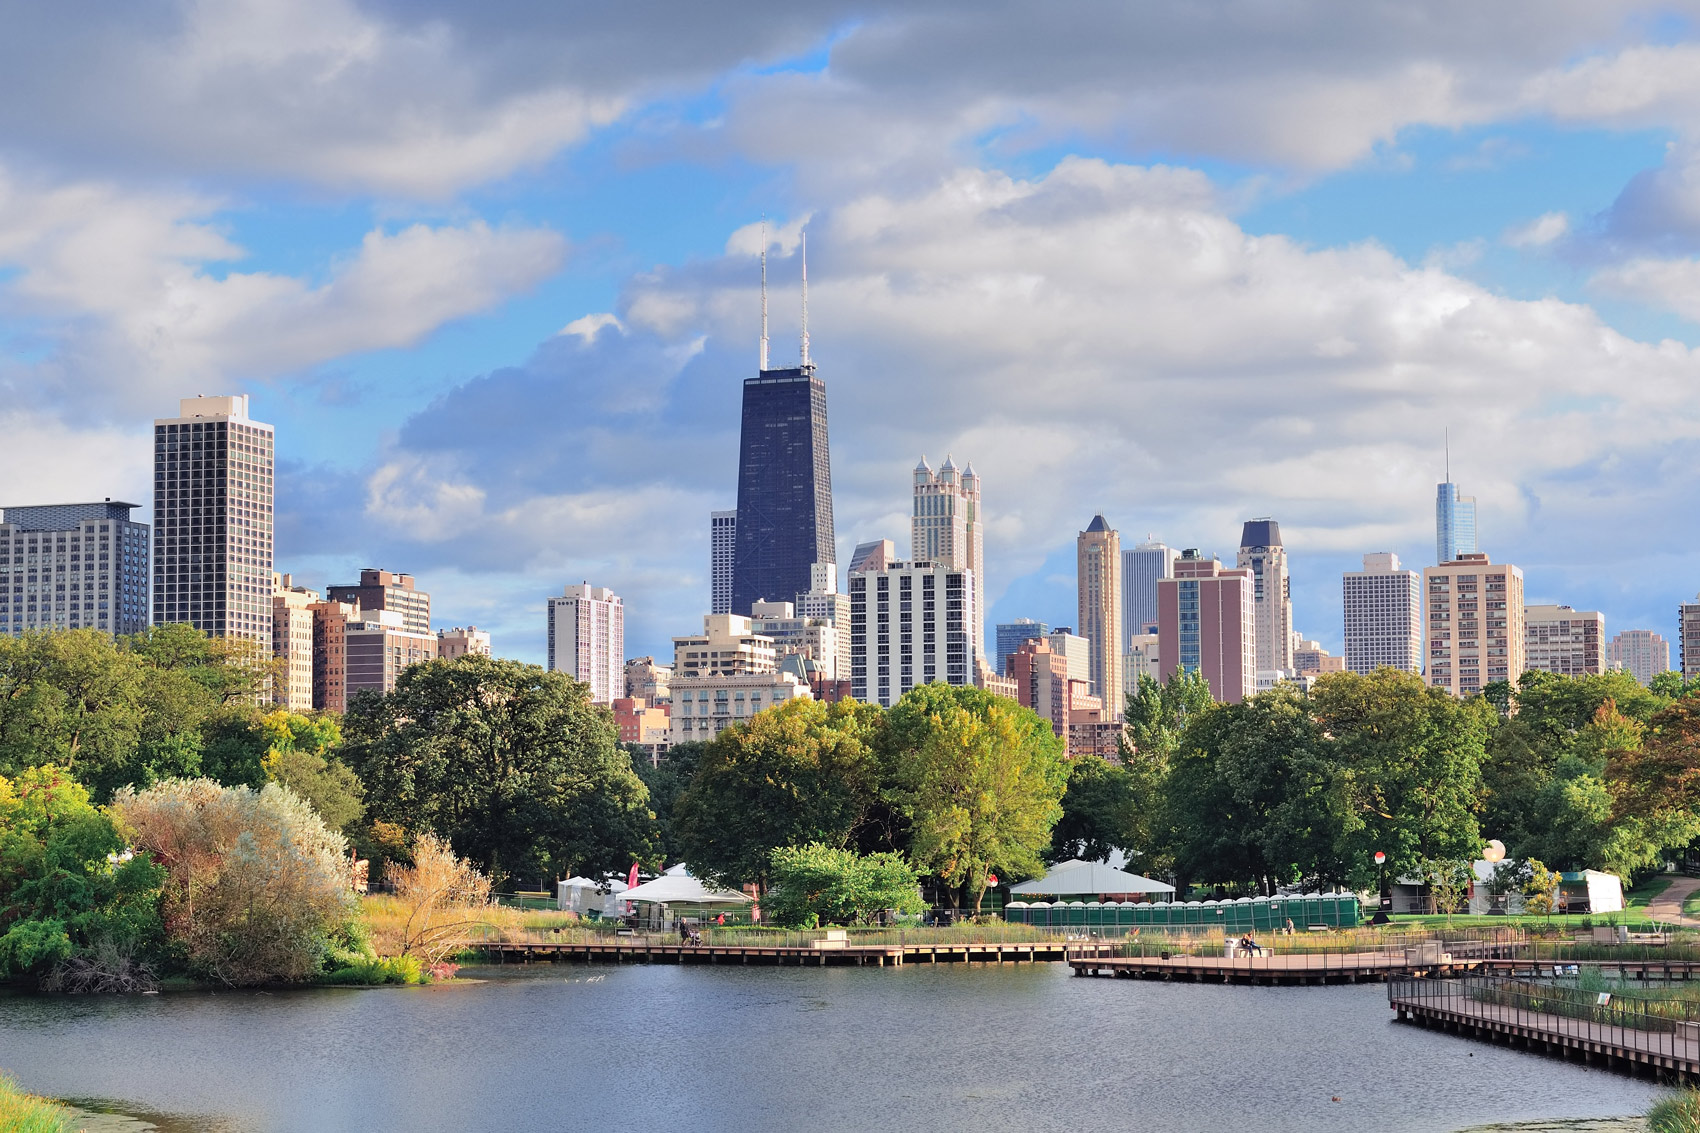 Image of Chicago, Illinois